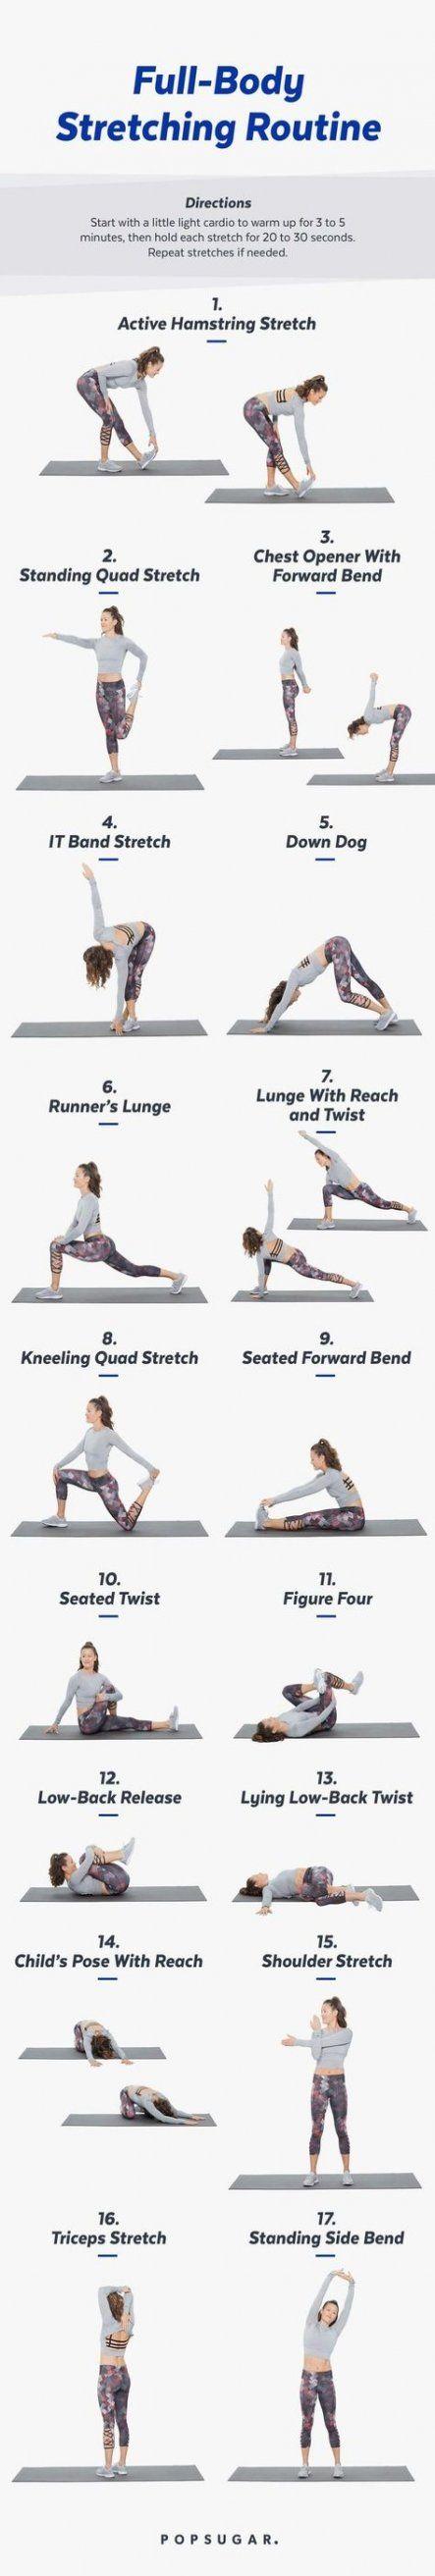 Fitness motivation pictures muscle shape 50+ ideas #motivation #fitness